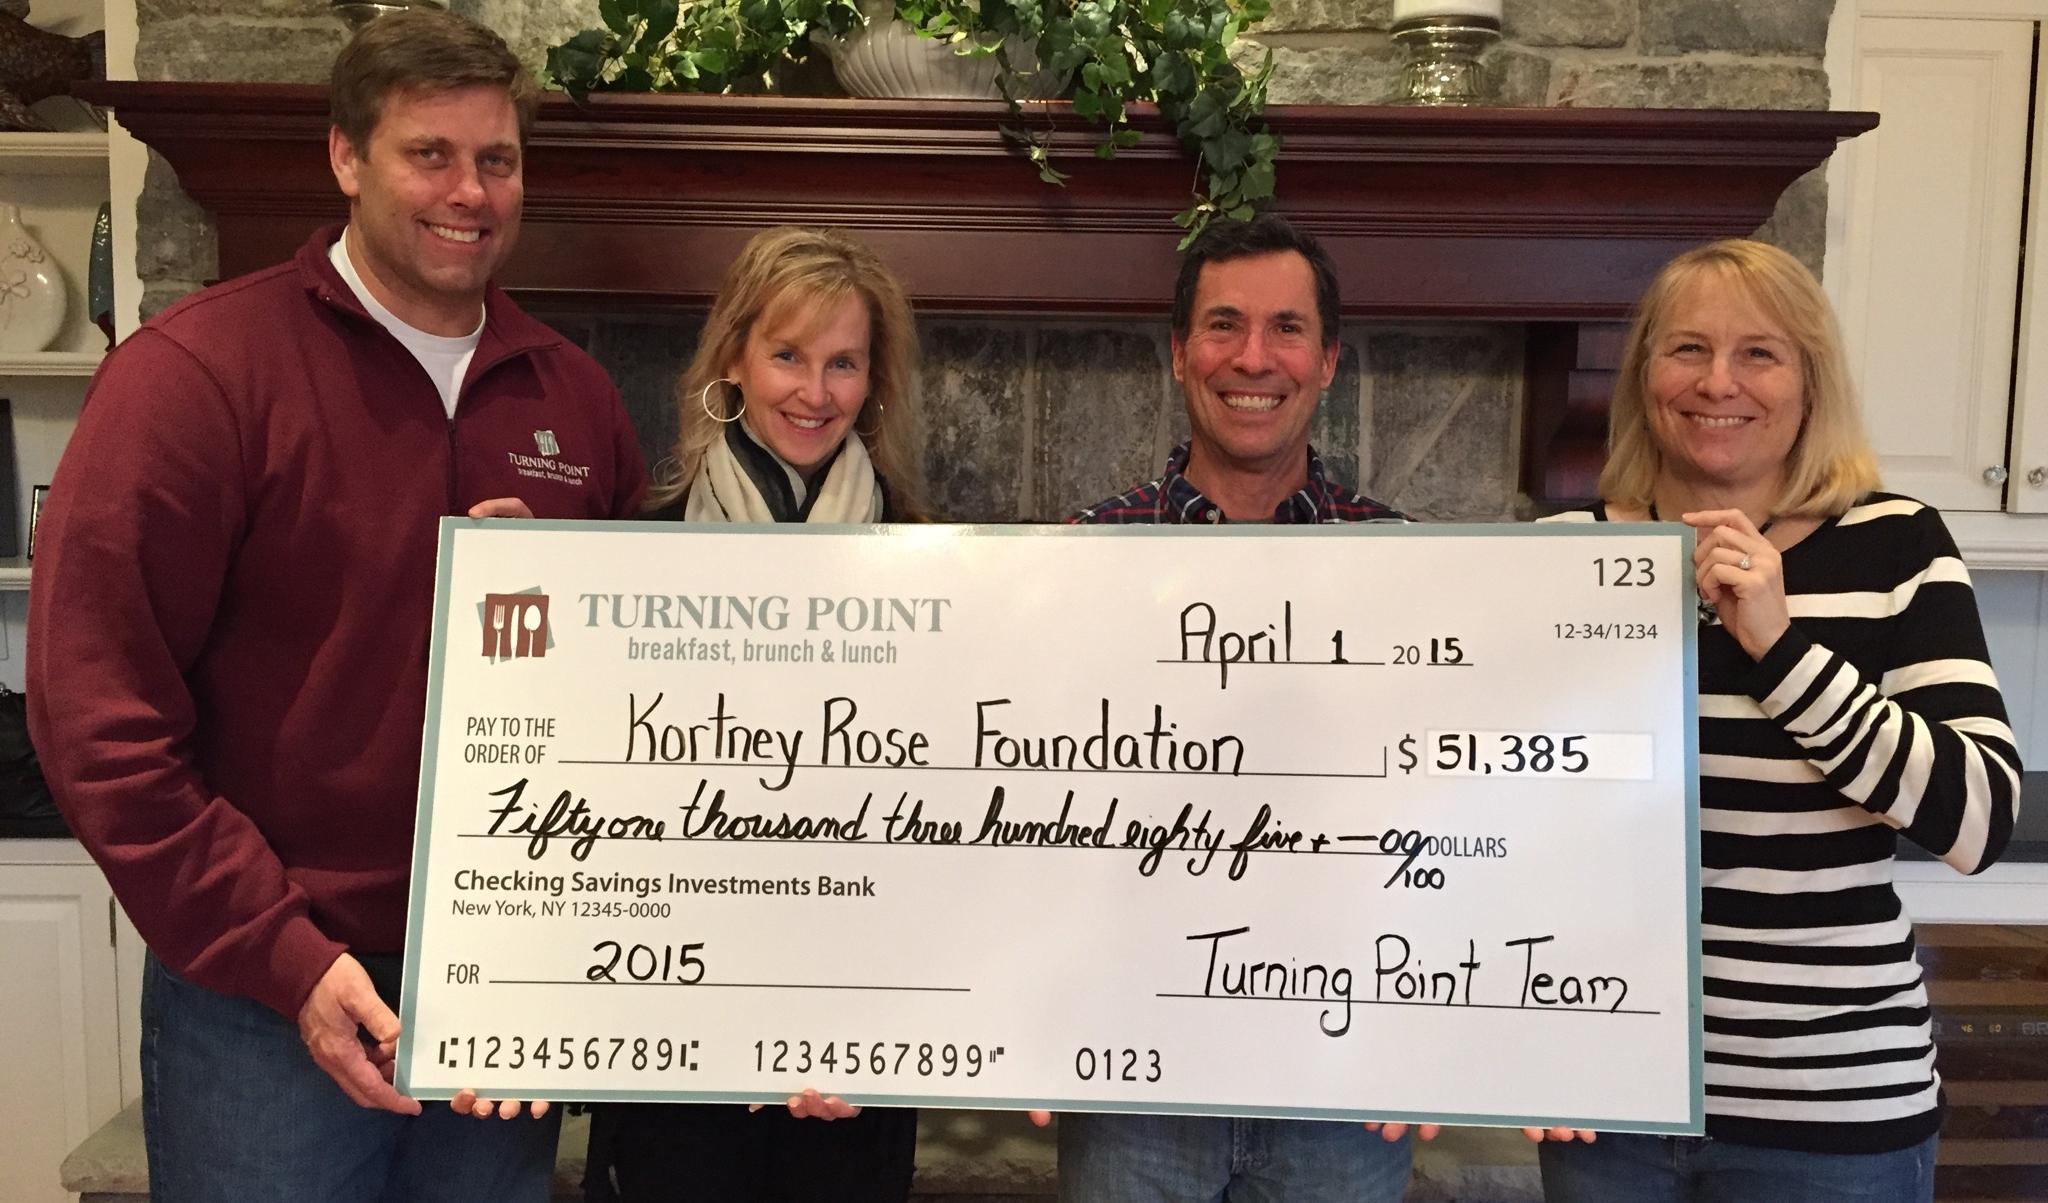 Turning Point Fundraiser